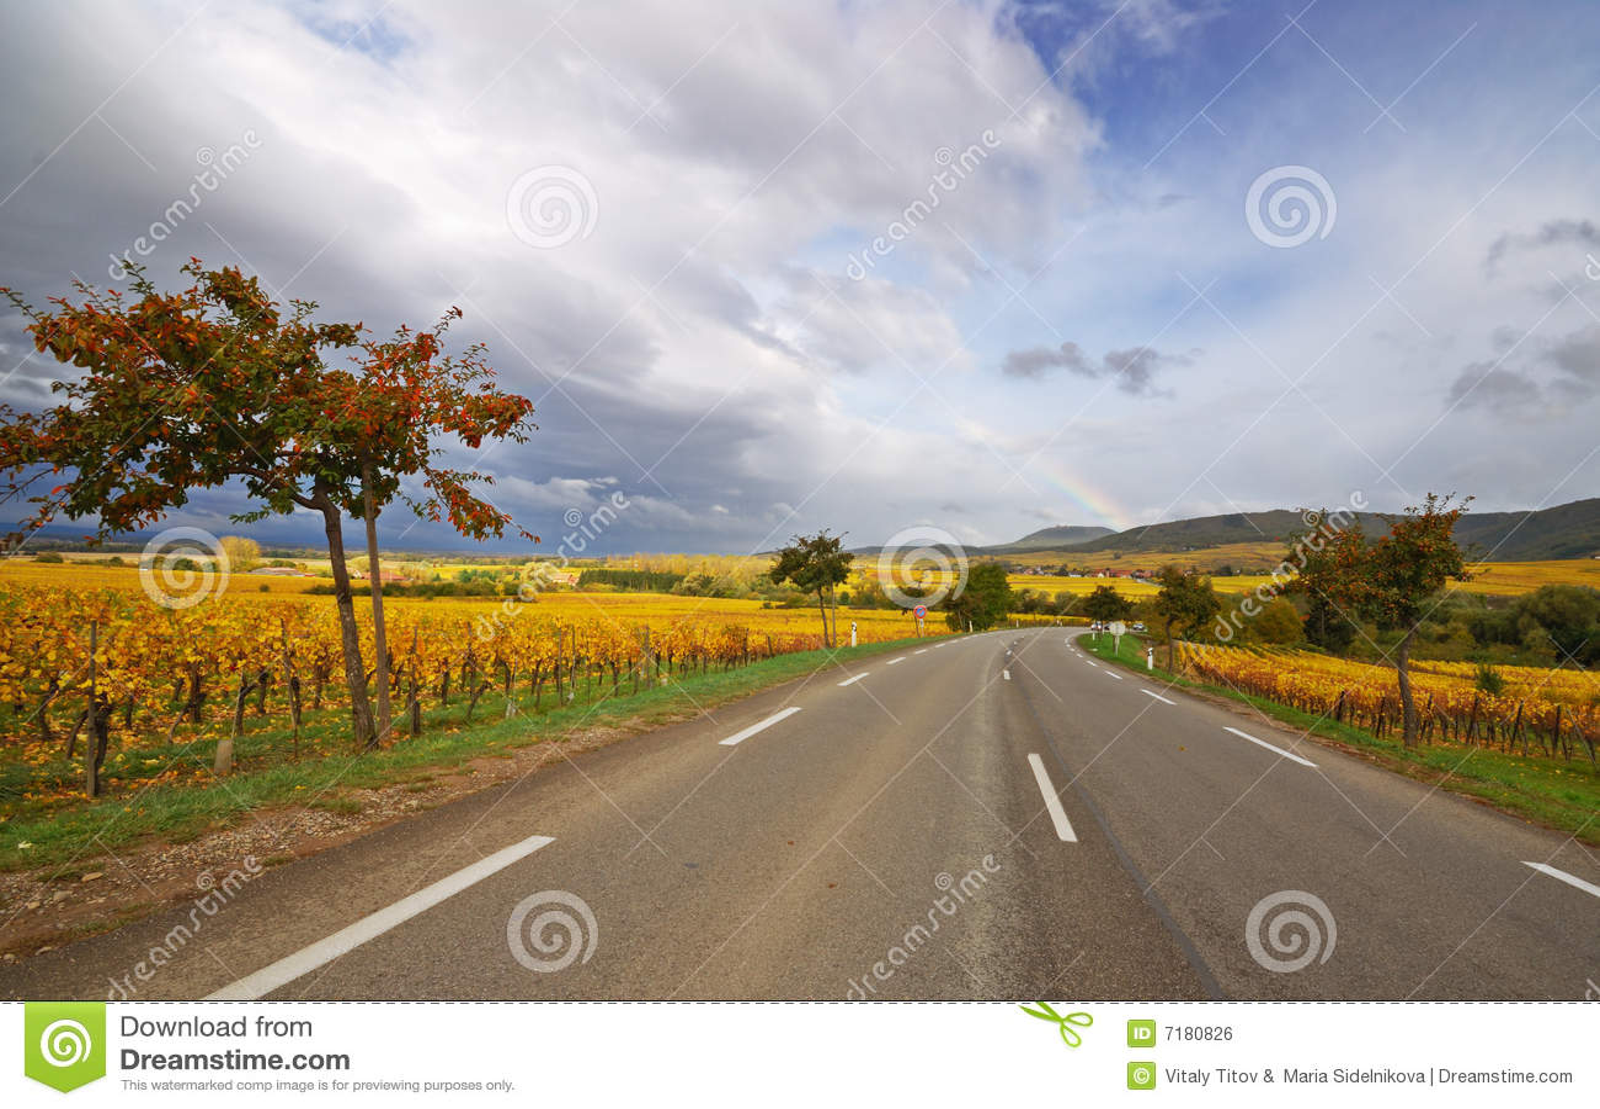 Autostrady trasy winograd